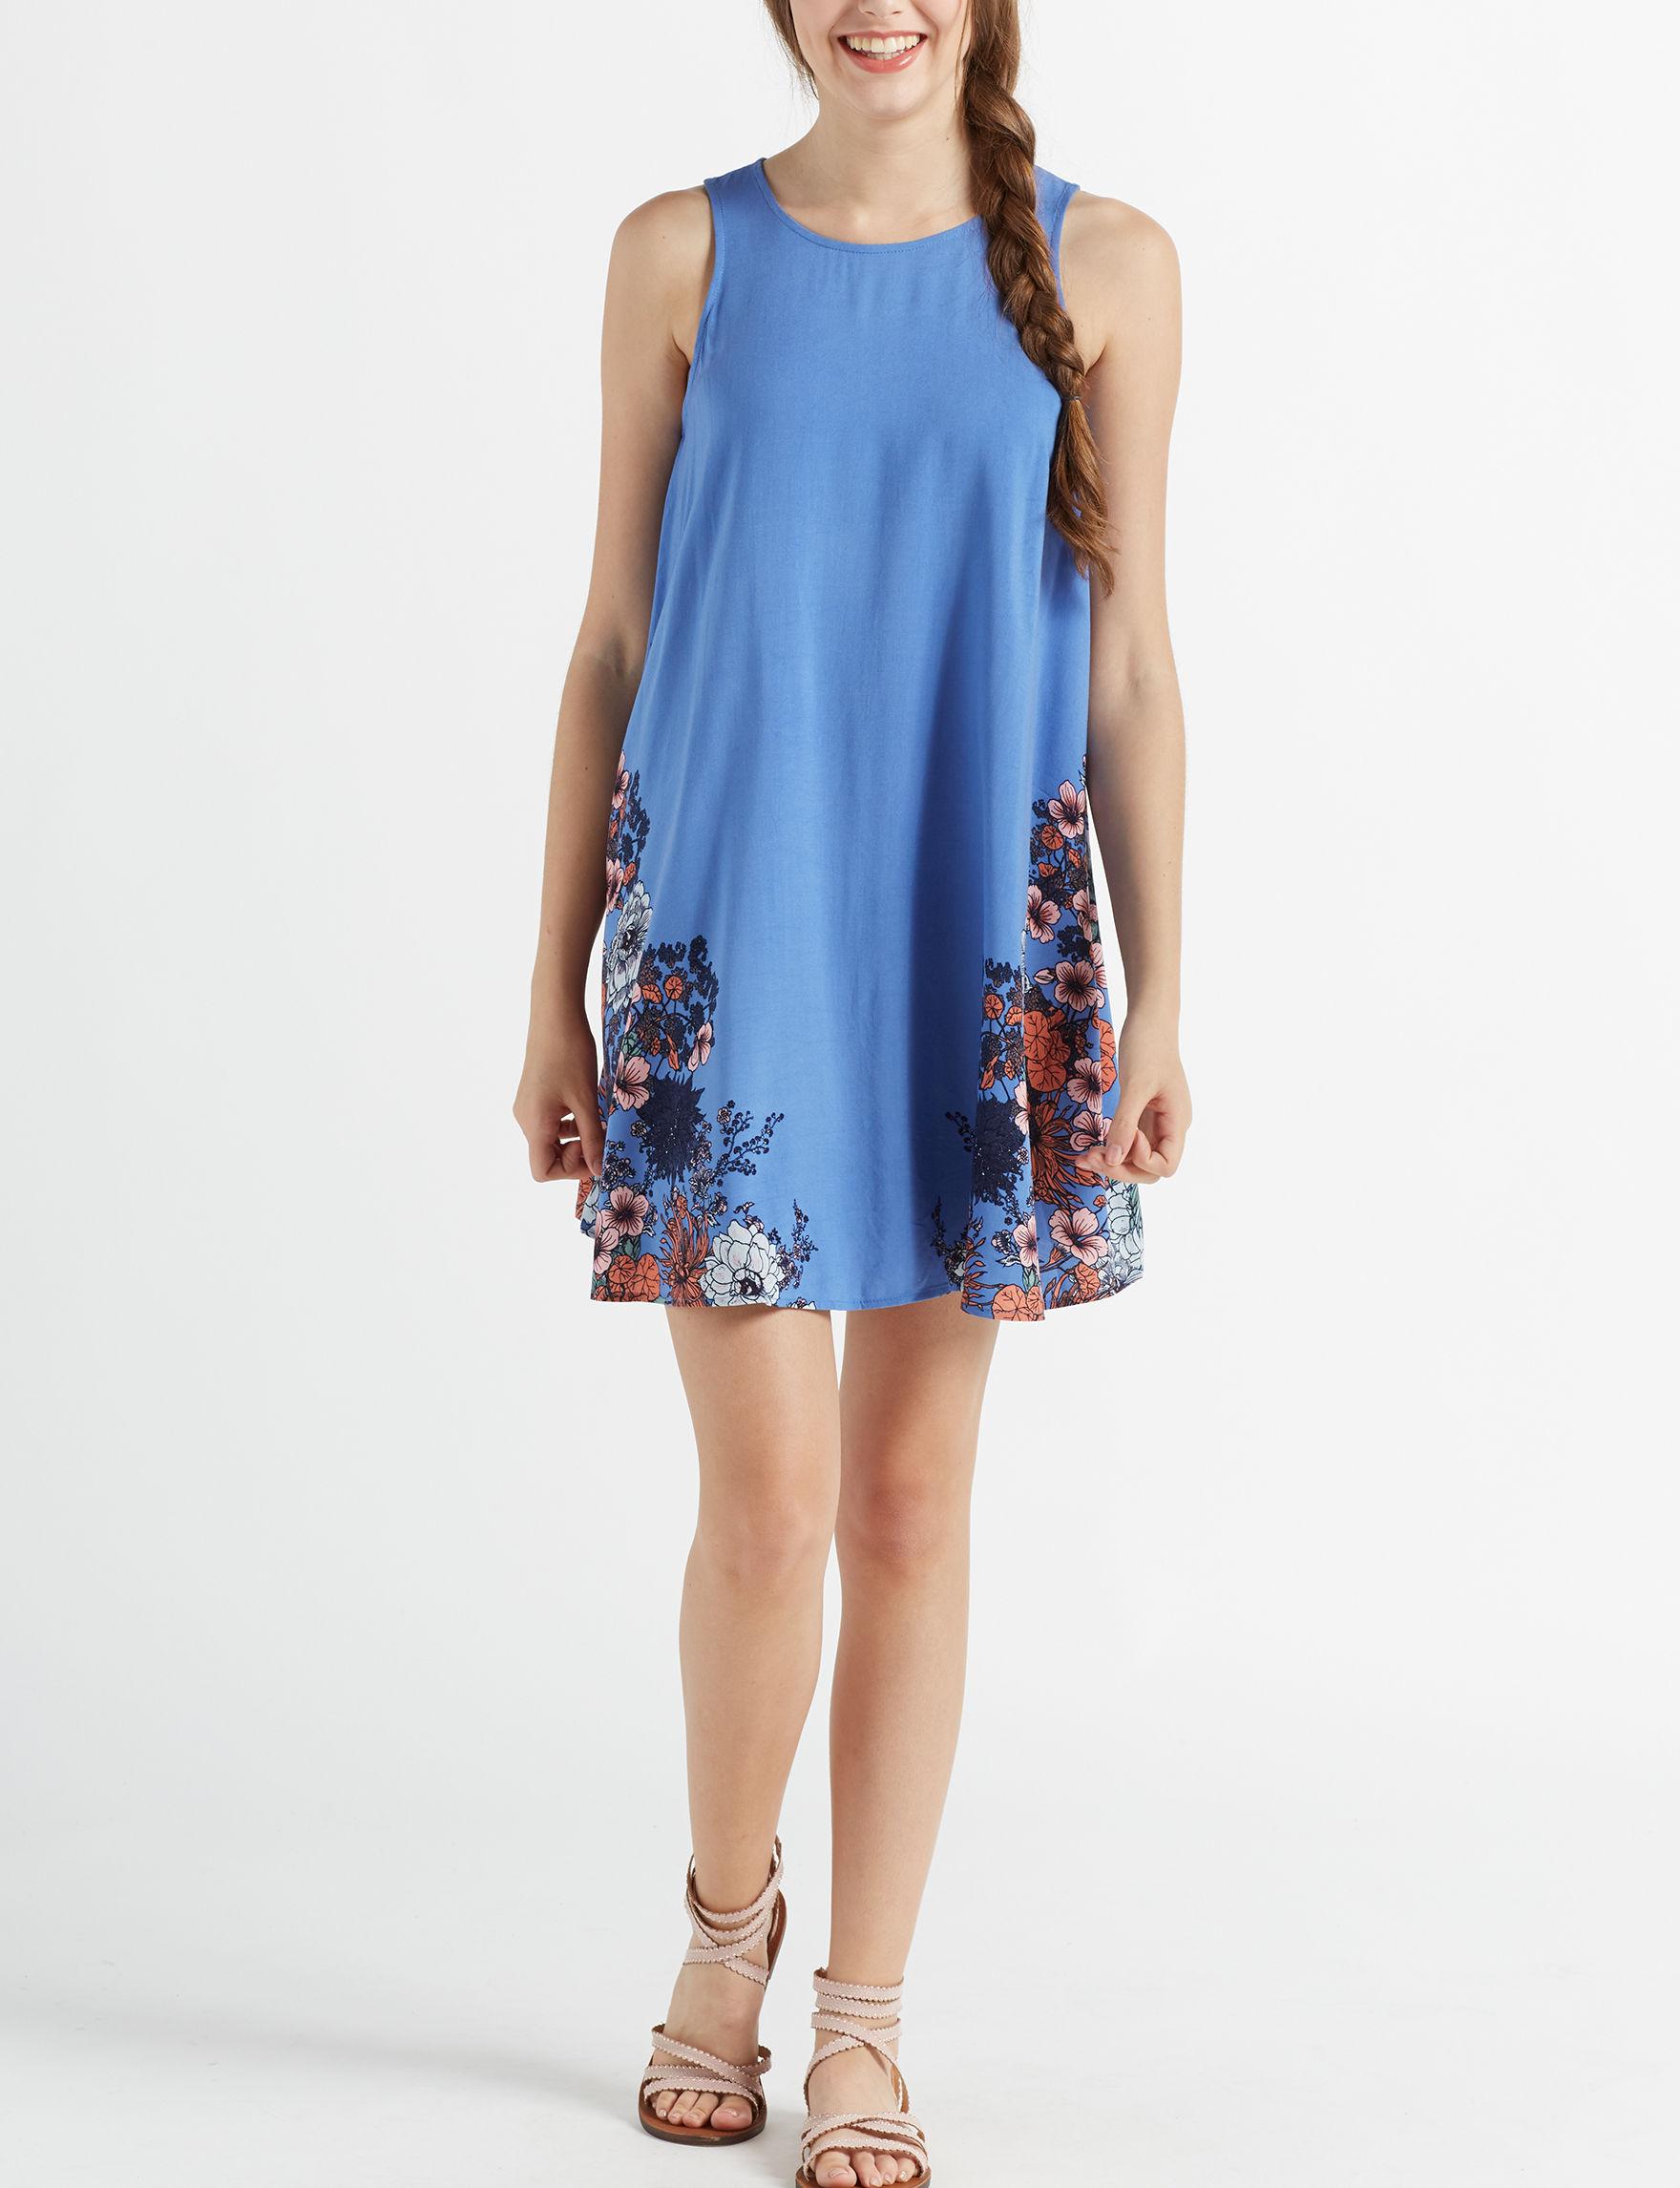 Taylor & Sage Blue Floral Everyday & Casual Shift Dresses